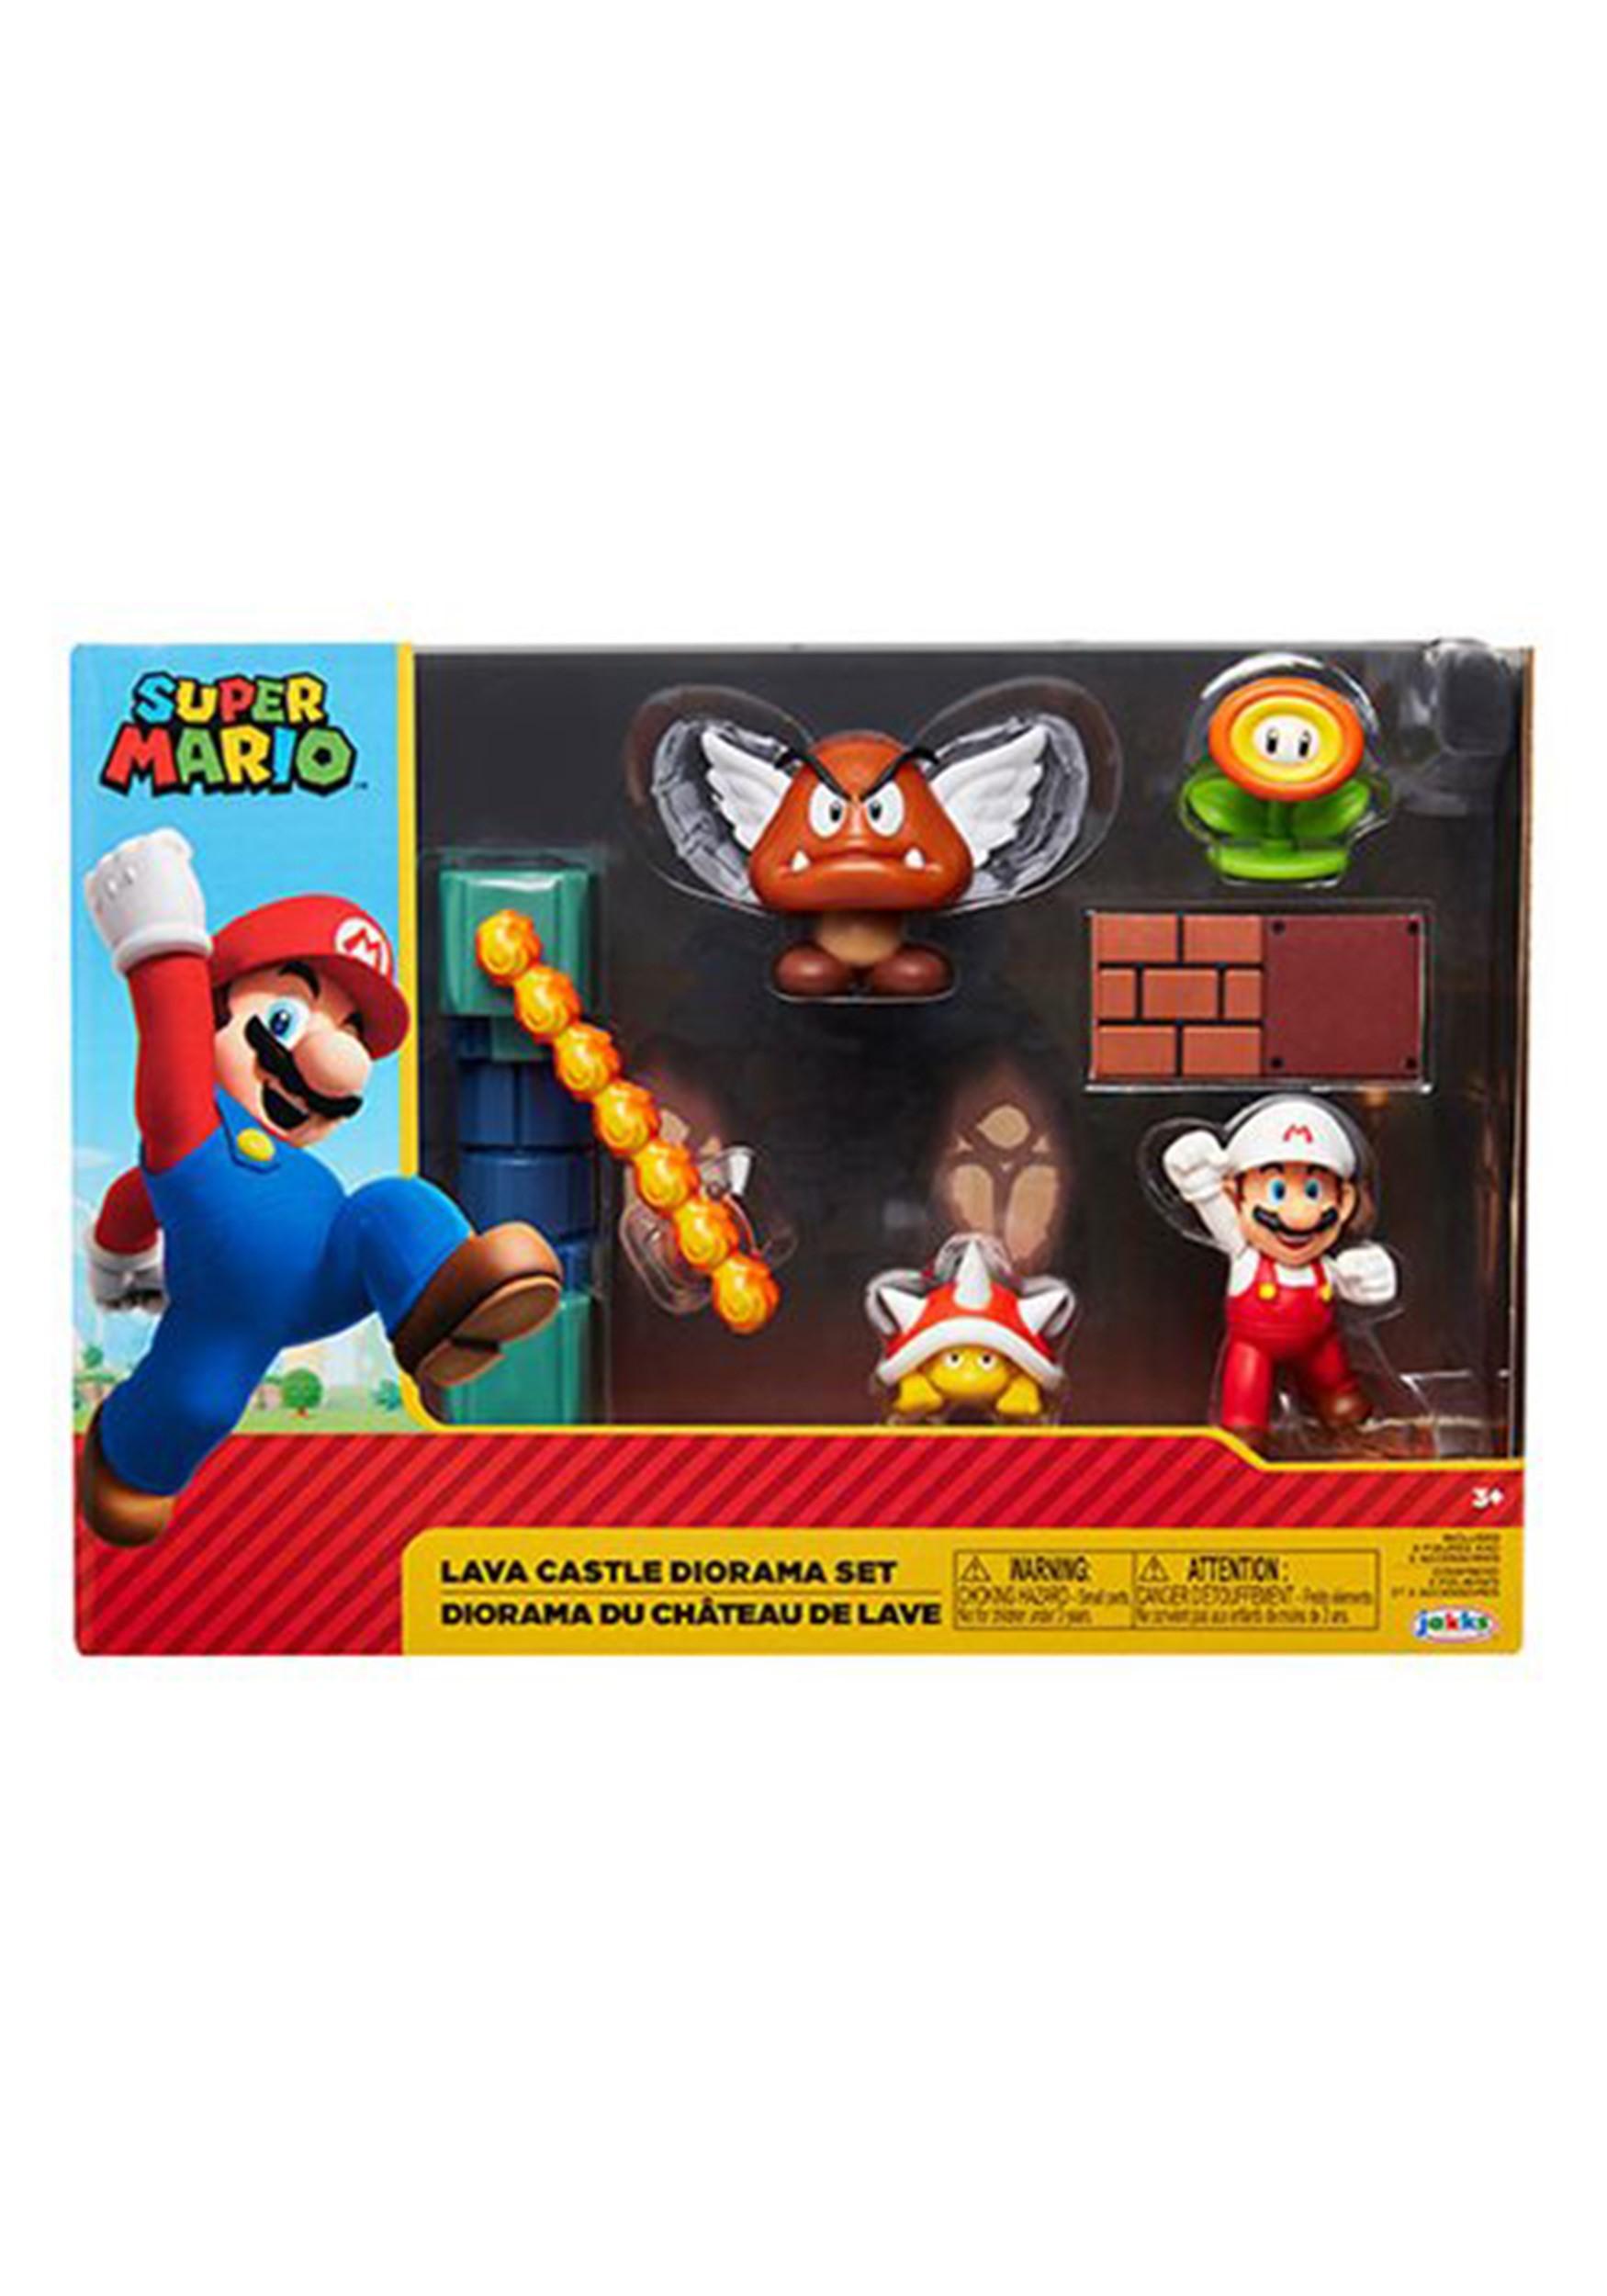 2 1/2 Inch Lava Castle World of Nintendo 2 Diorama Set